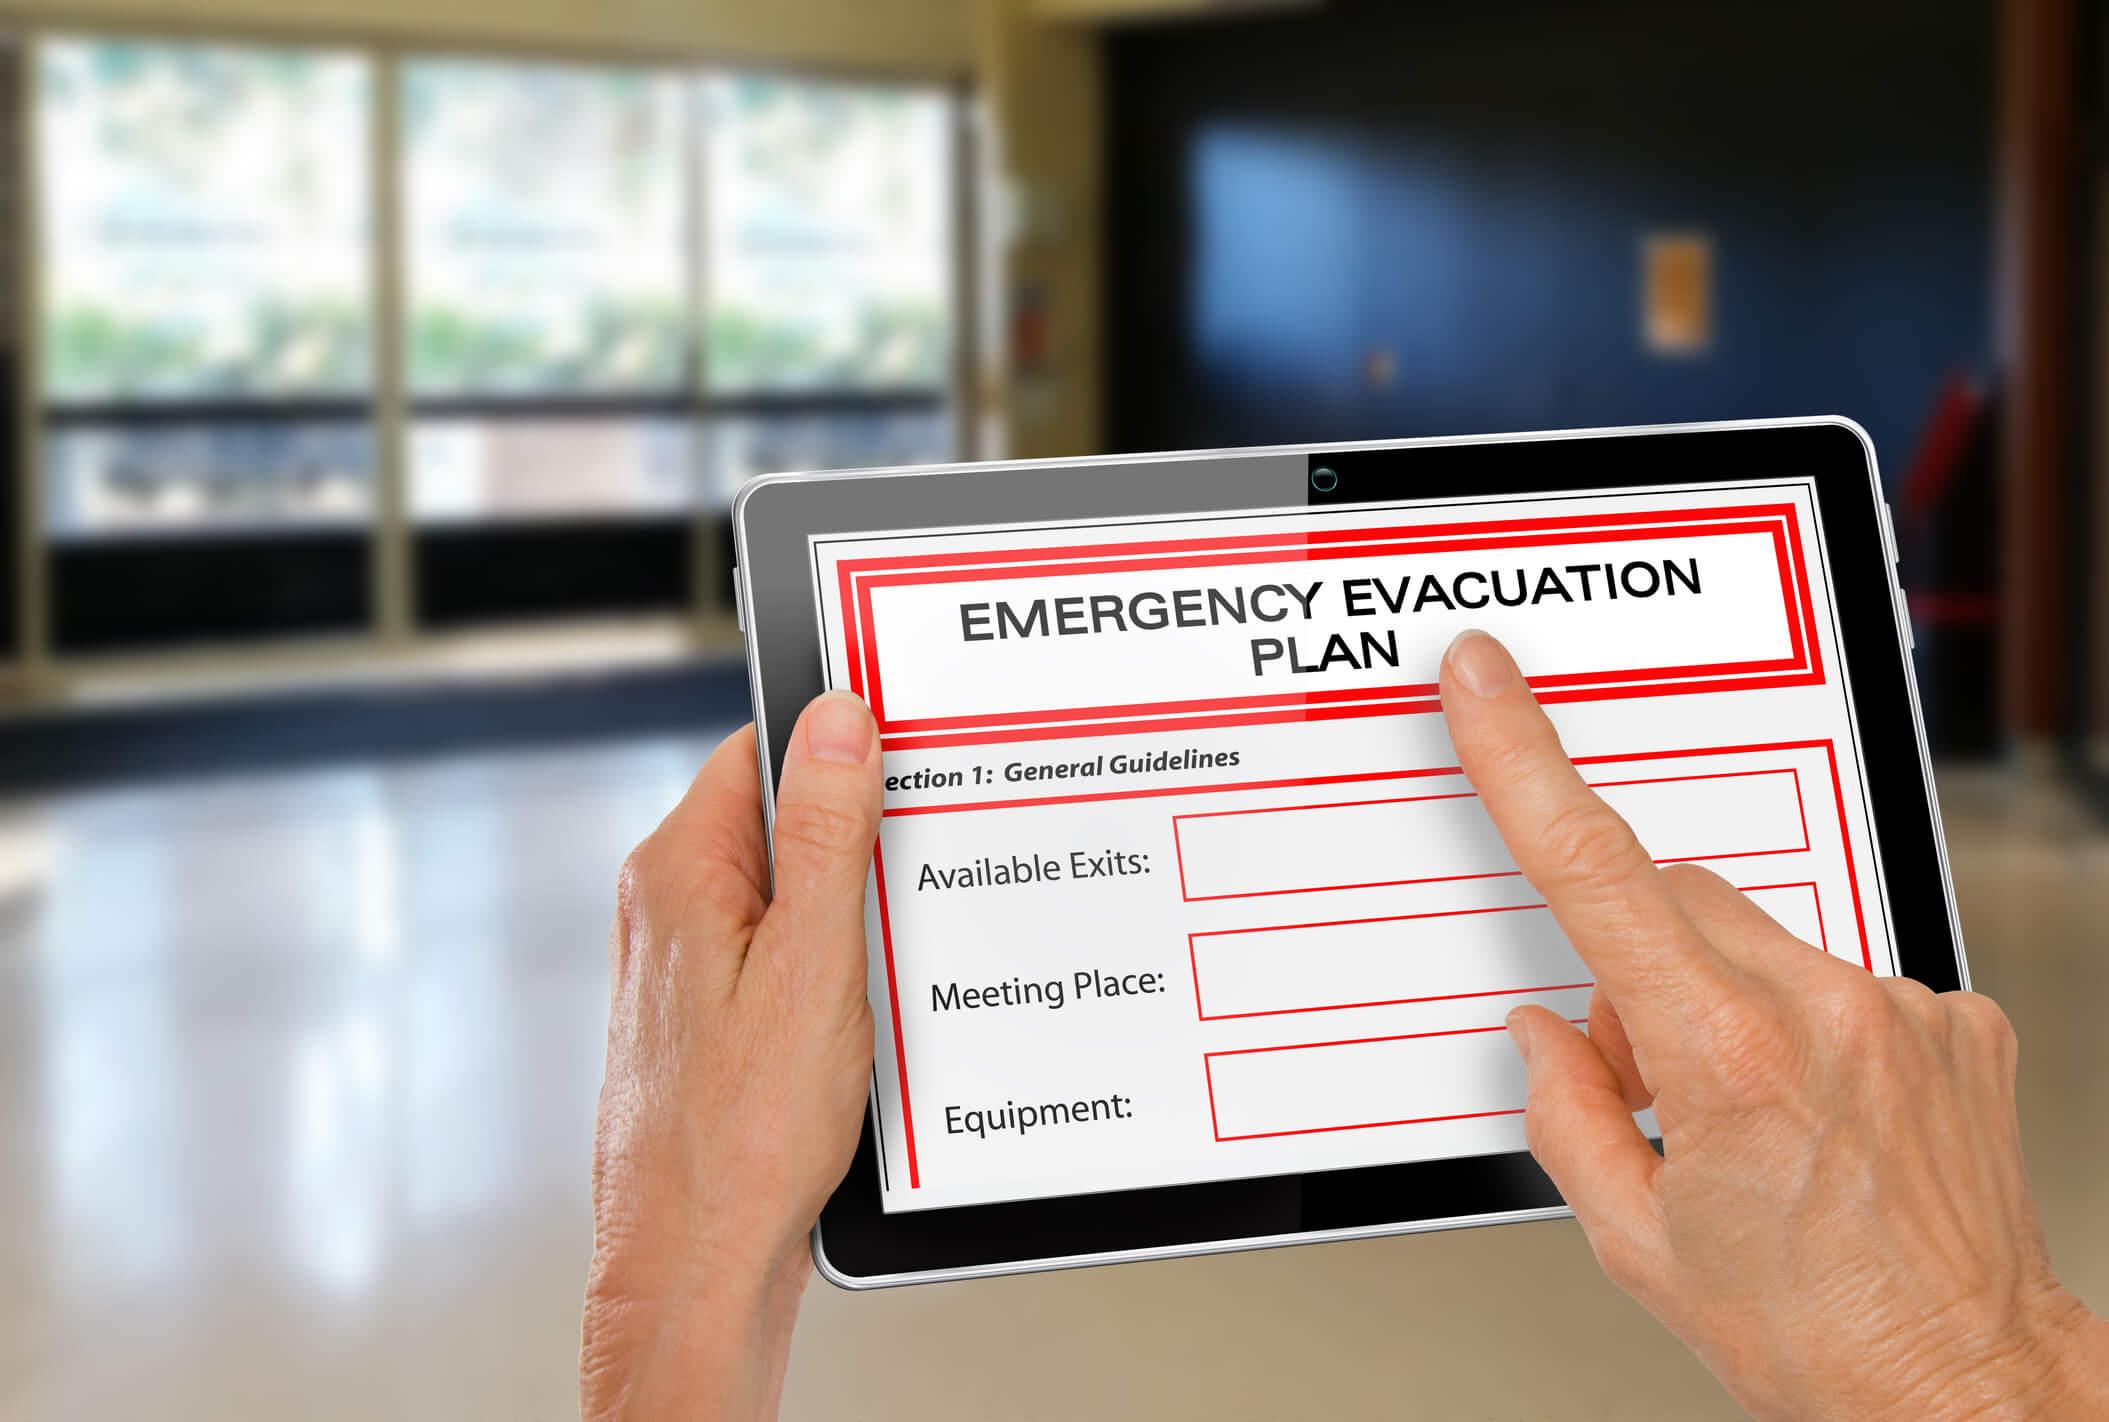 Emergency evacuation plan tips